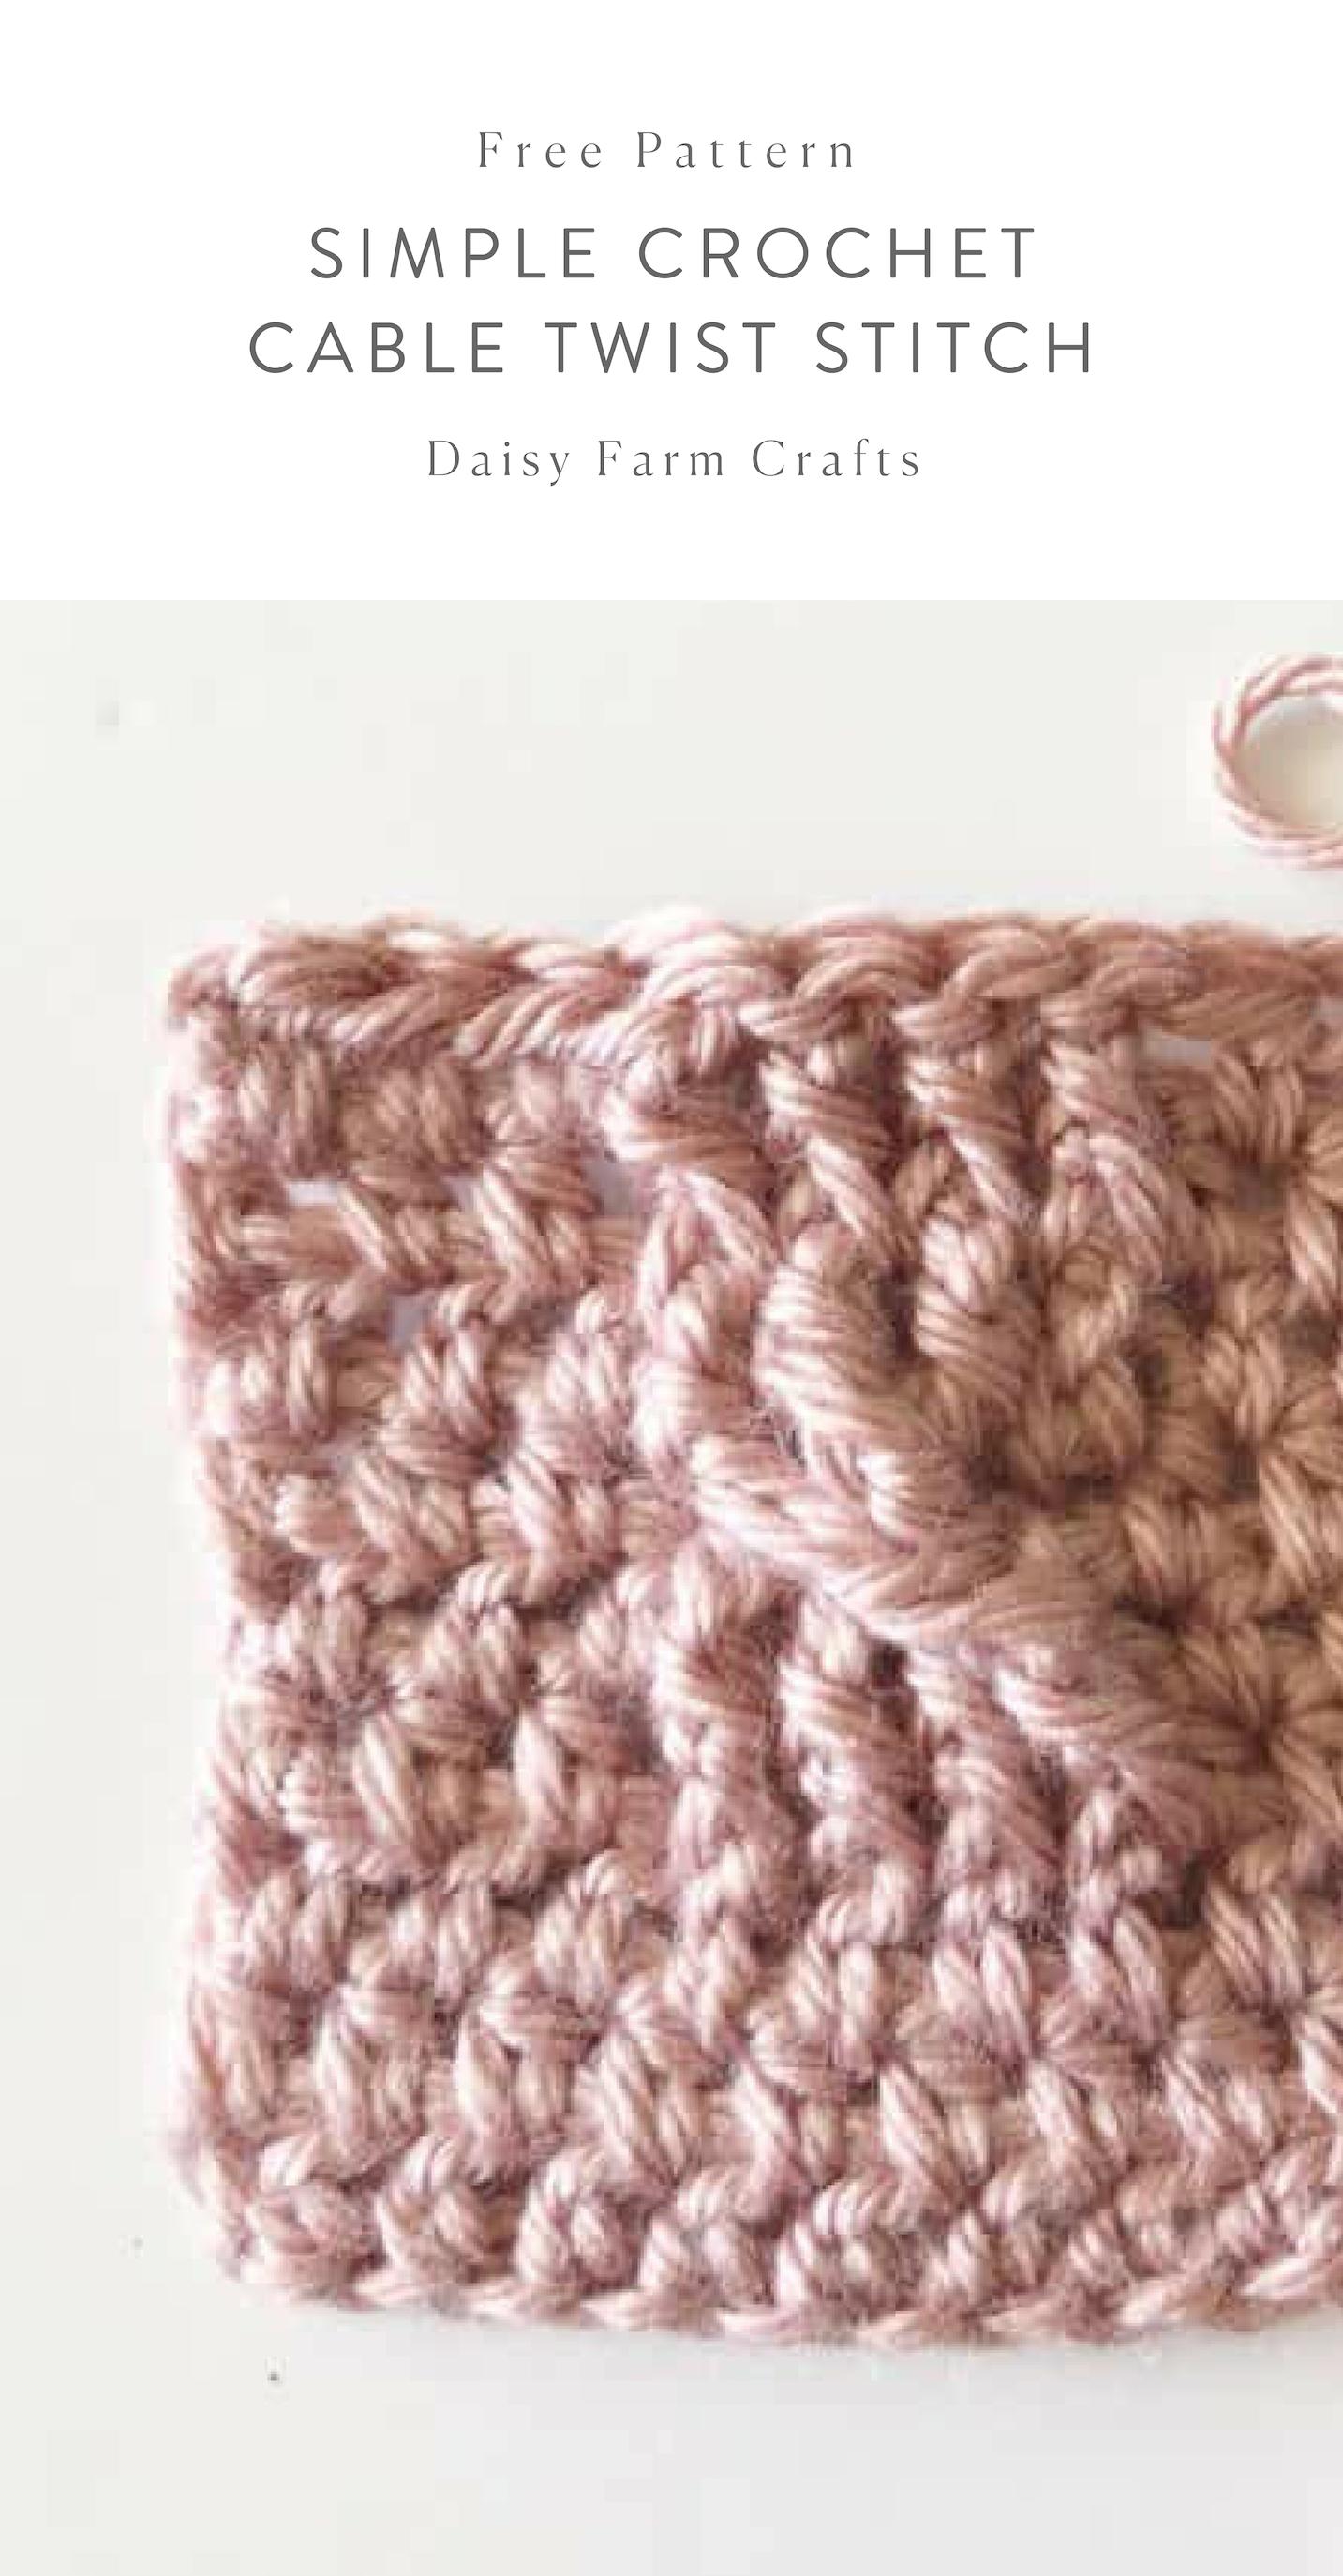 Free Pattern Simple Crochet Cable Twist Stitch Free Crochet